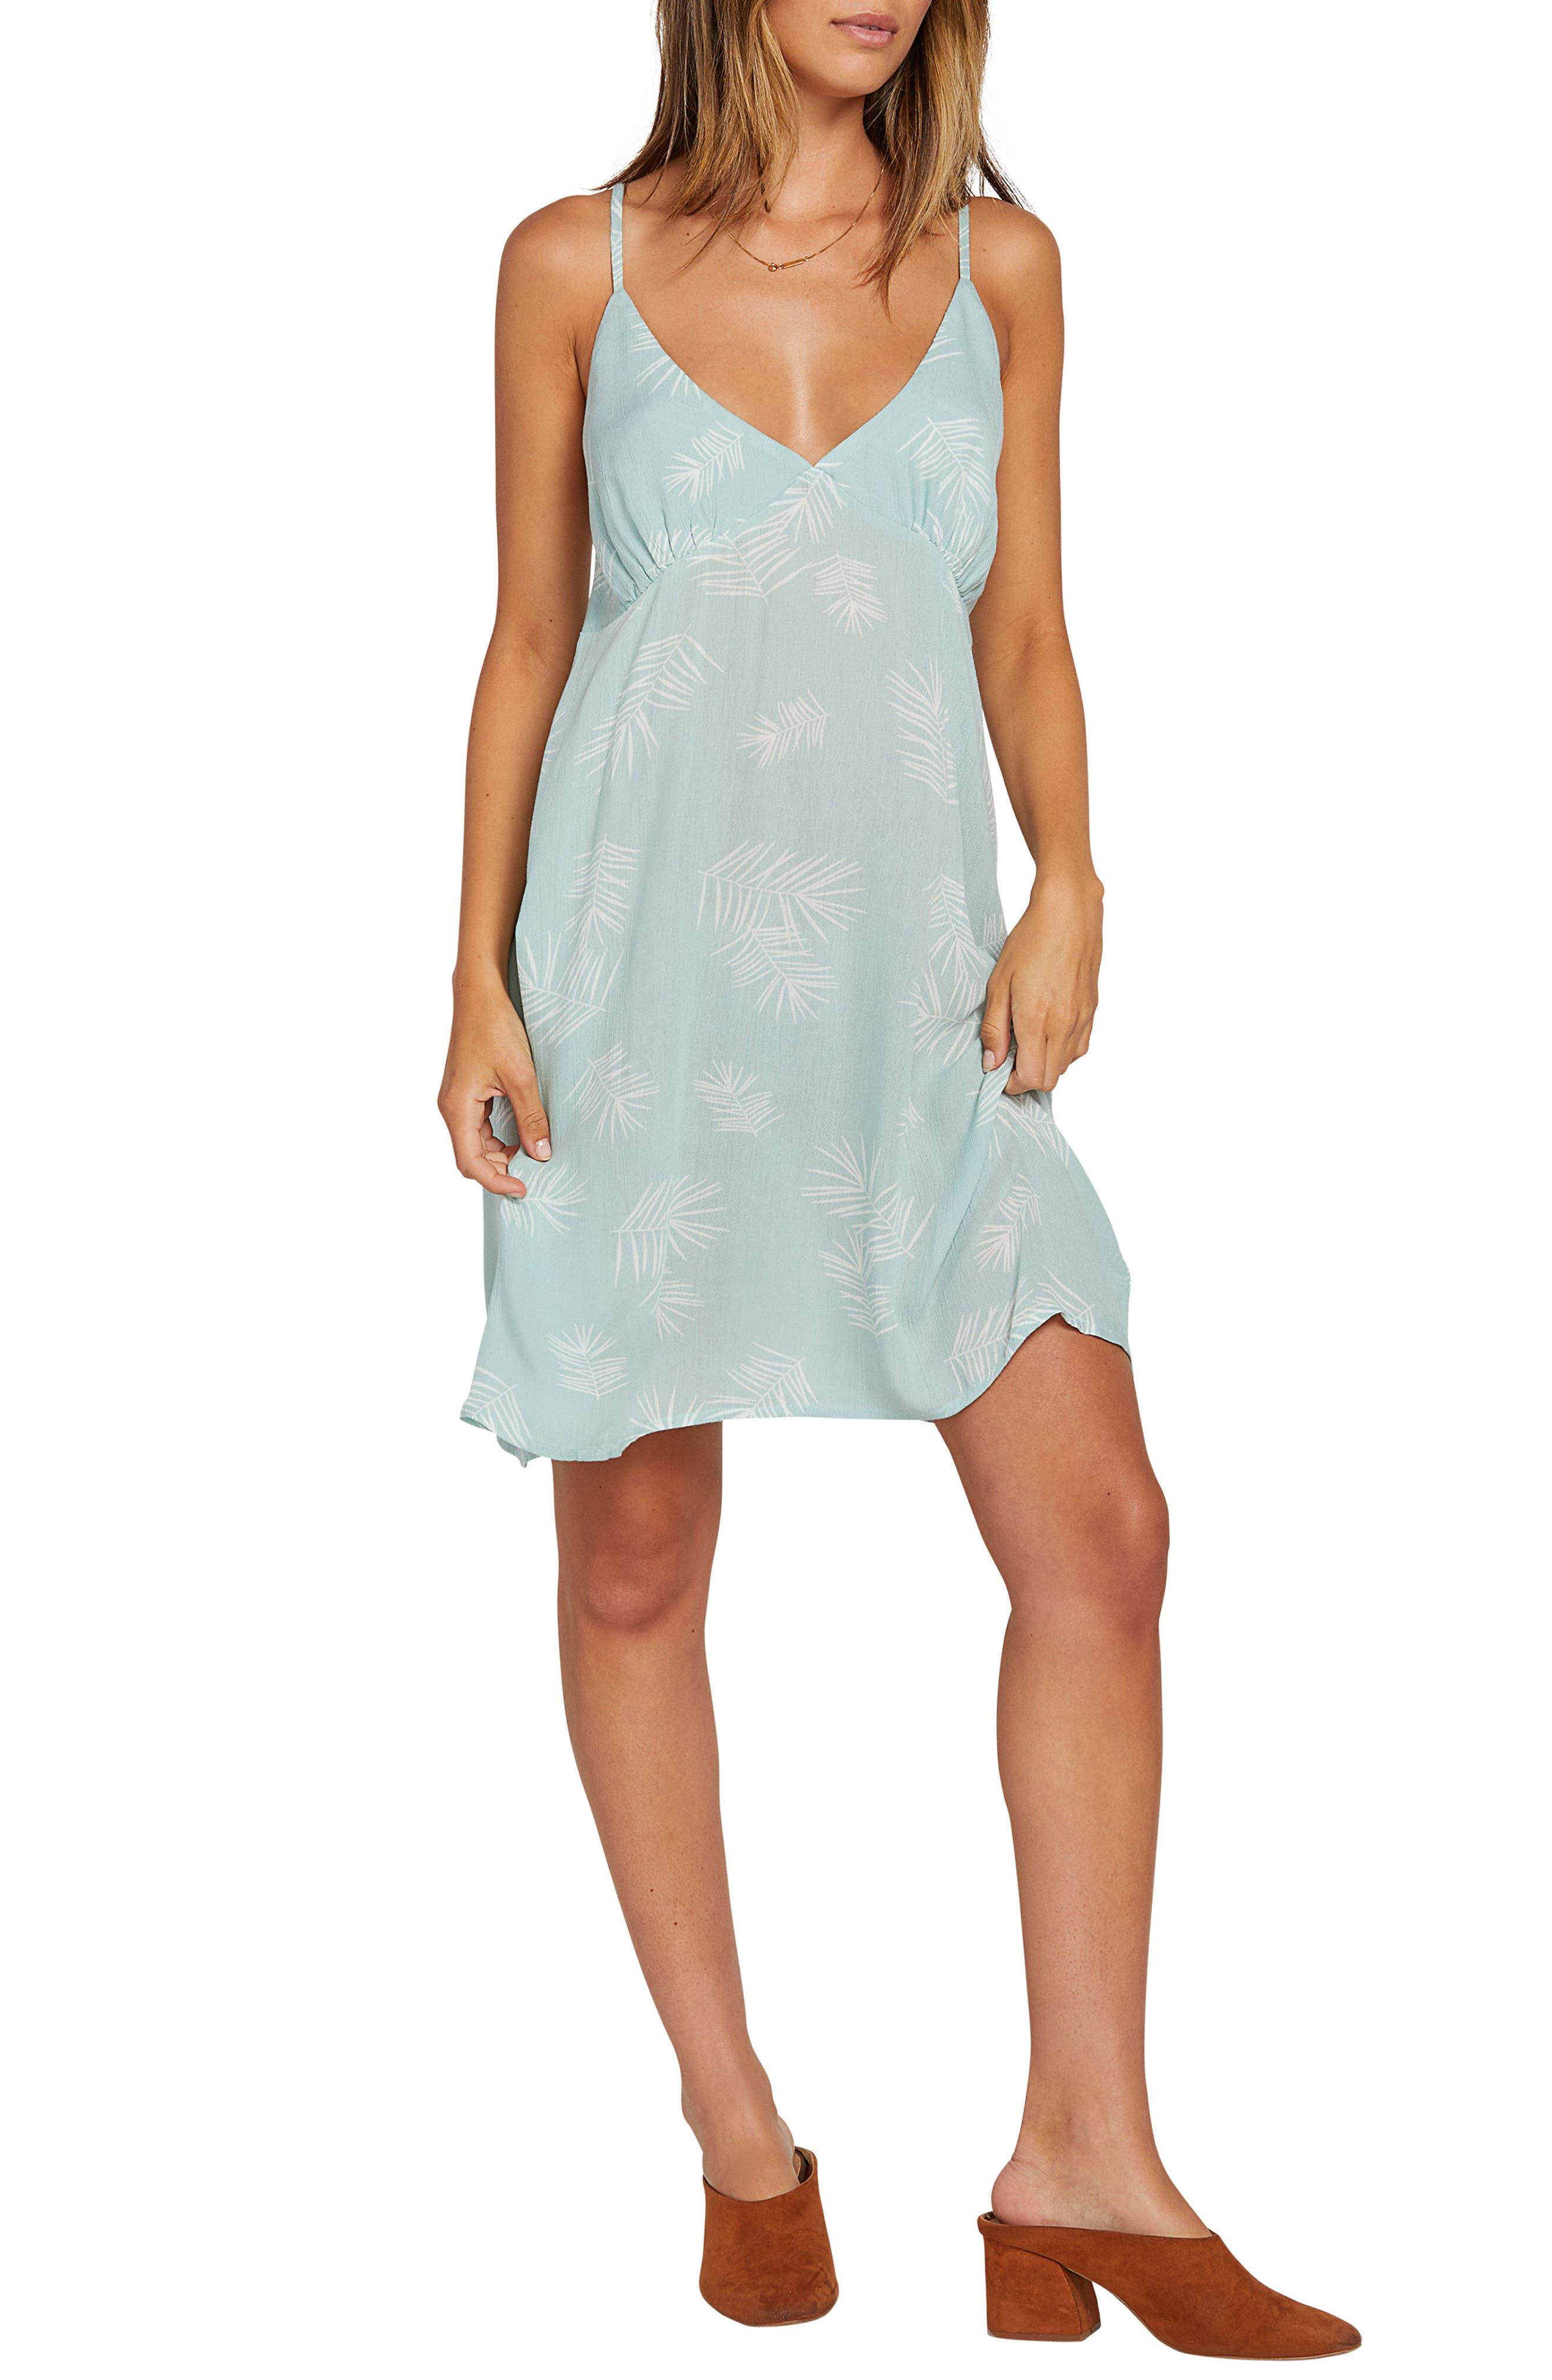 Volcom Now Or Now Cherry Print Tank Minidress, Blue